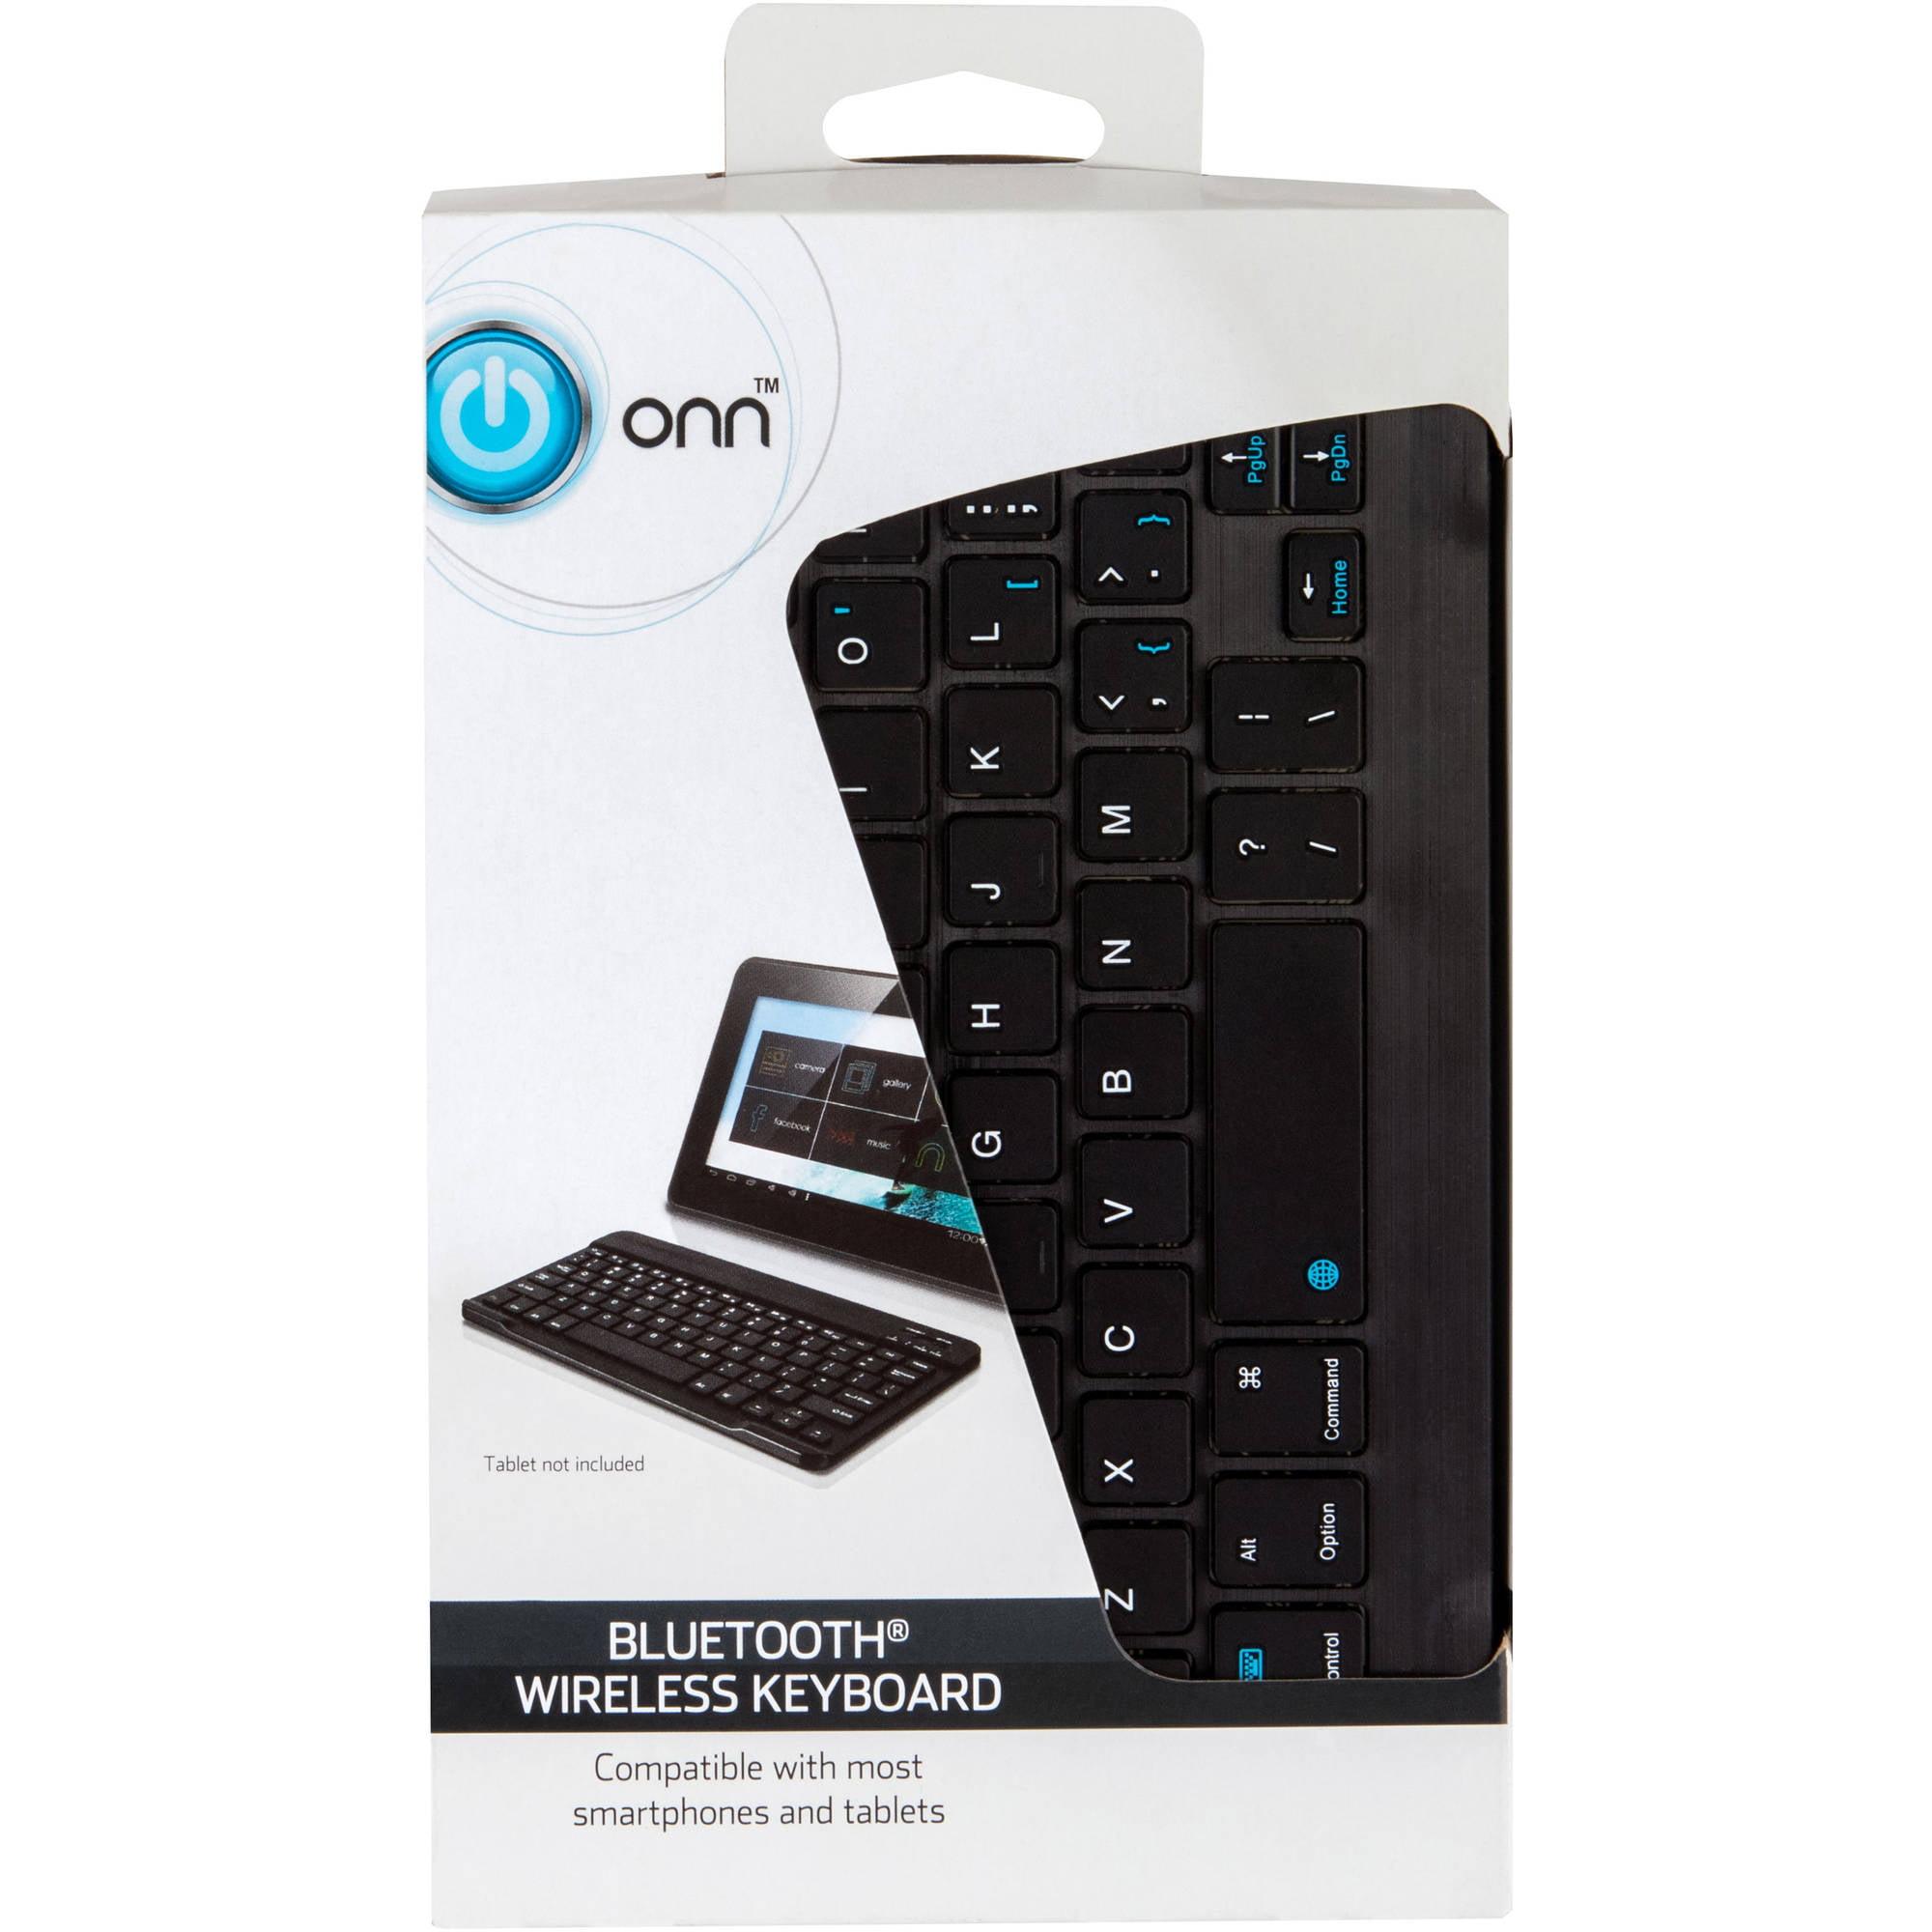 Onn Onb15ta201 Bluetooth Wireless Keyboard Walmart